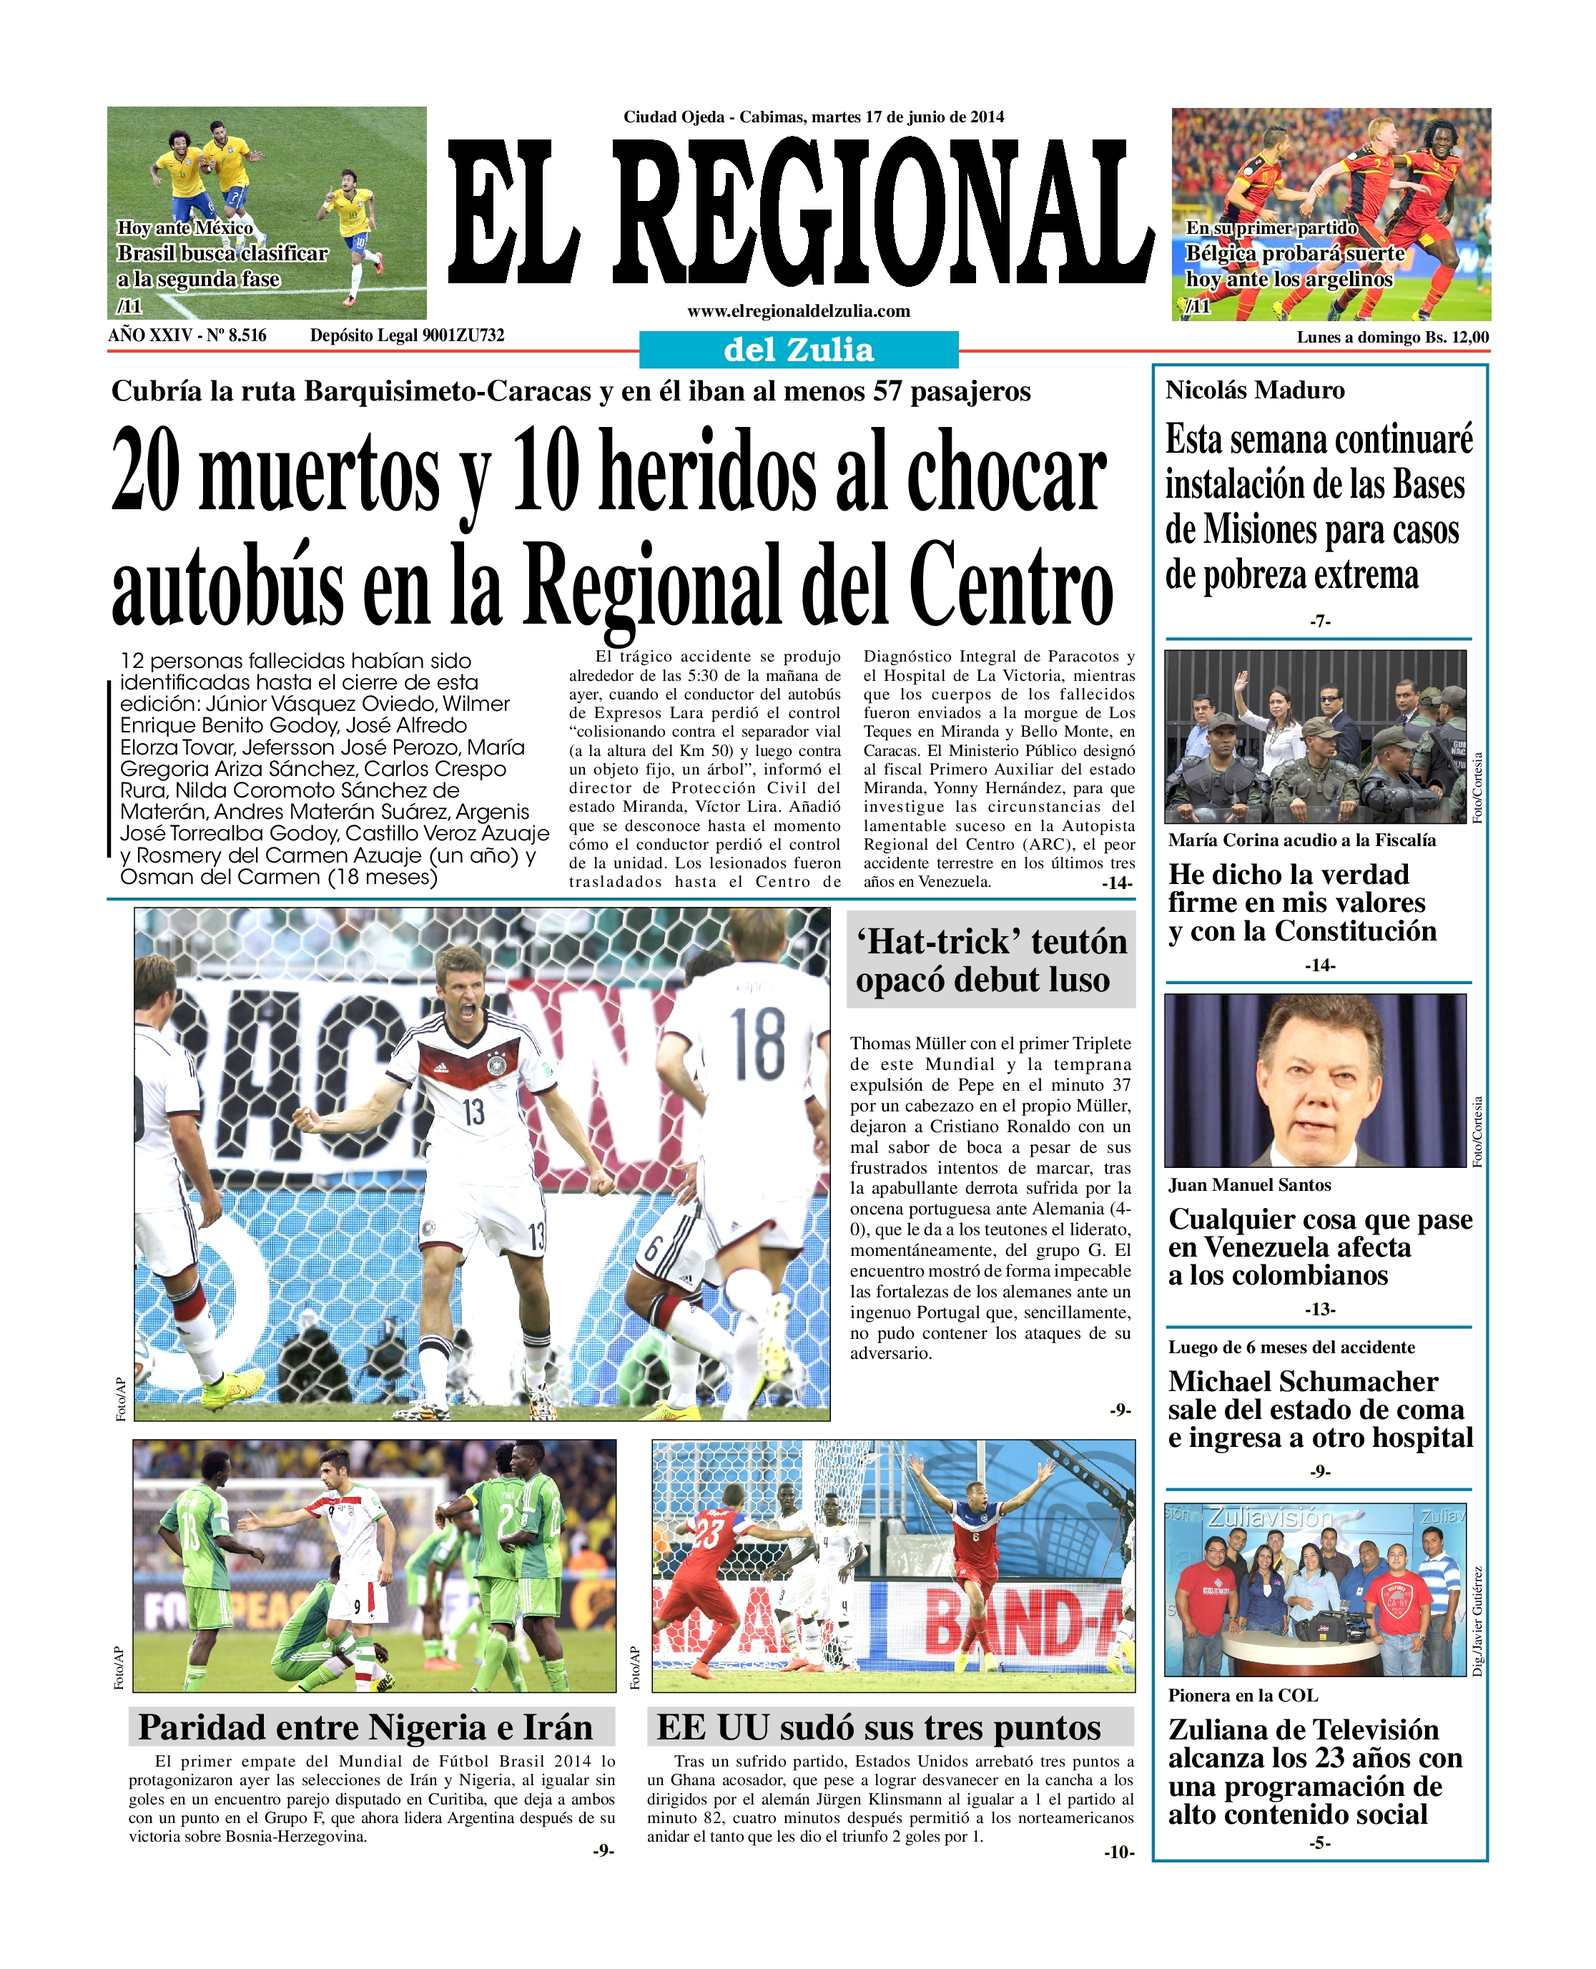 Calaméo - EL Regional del Zulia 17-06-2014